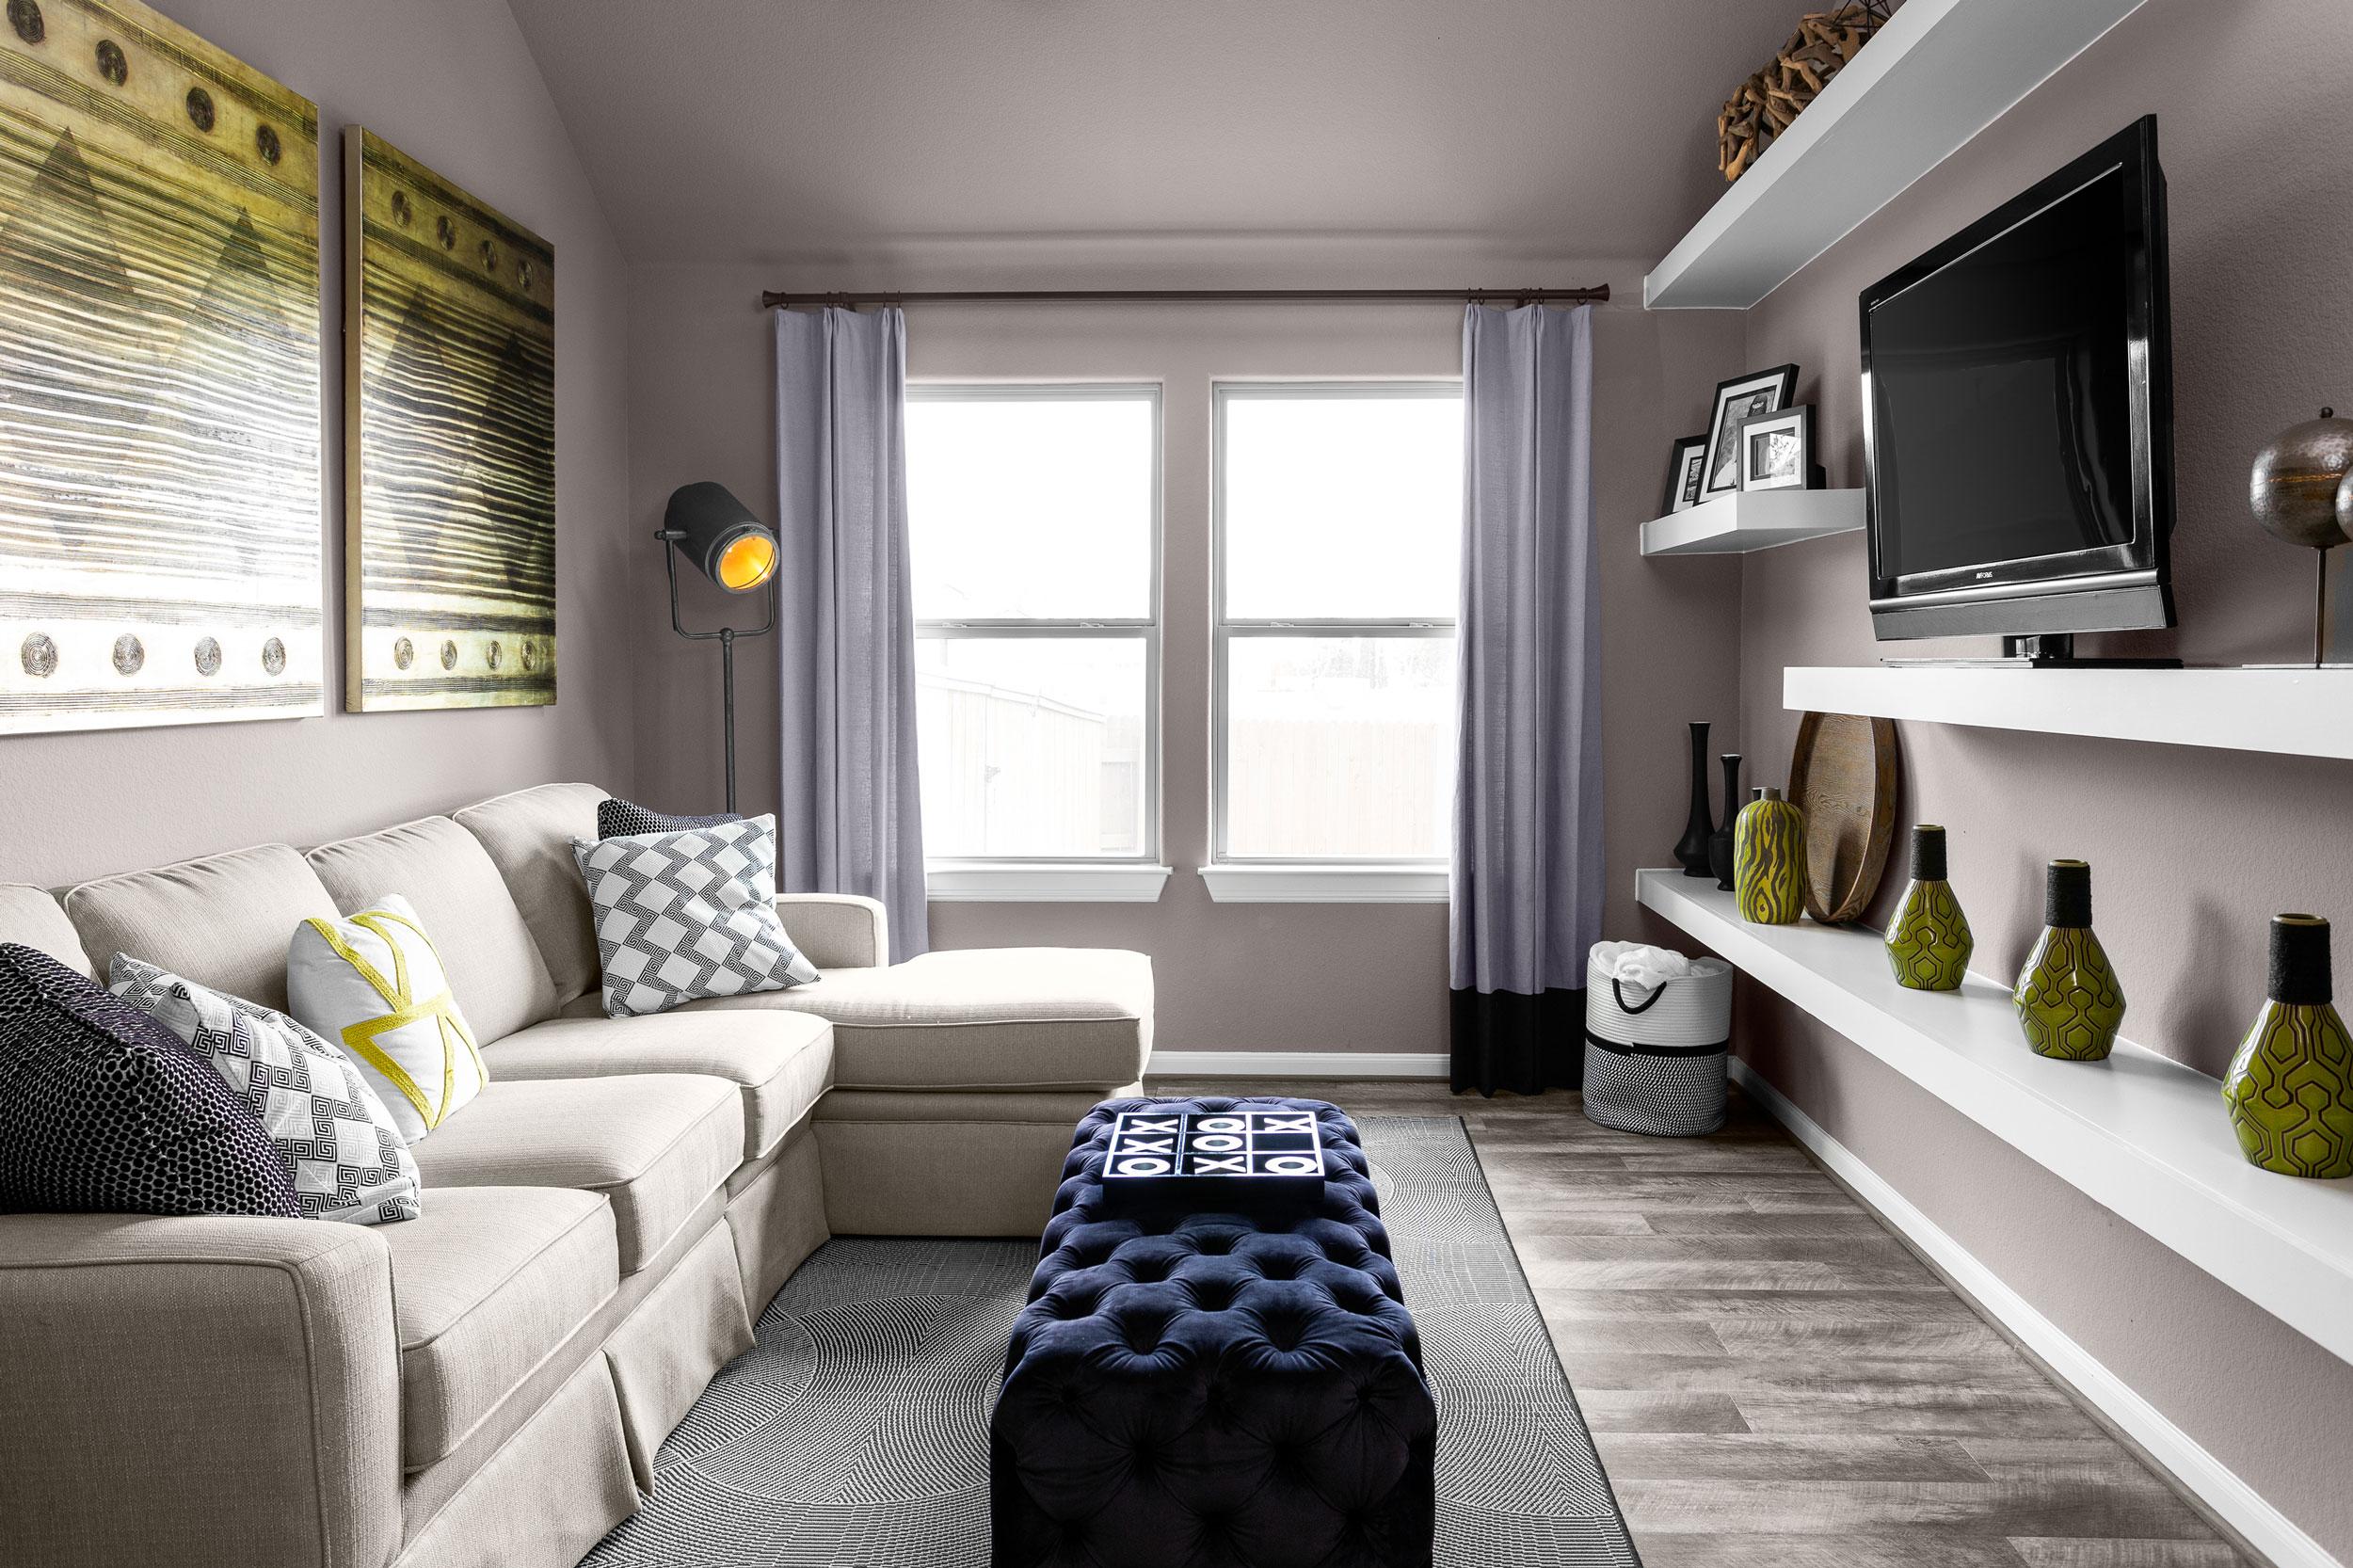 tv-room-interior-design-modern.jpg